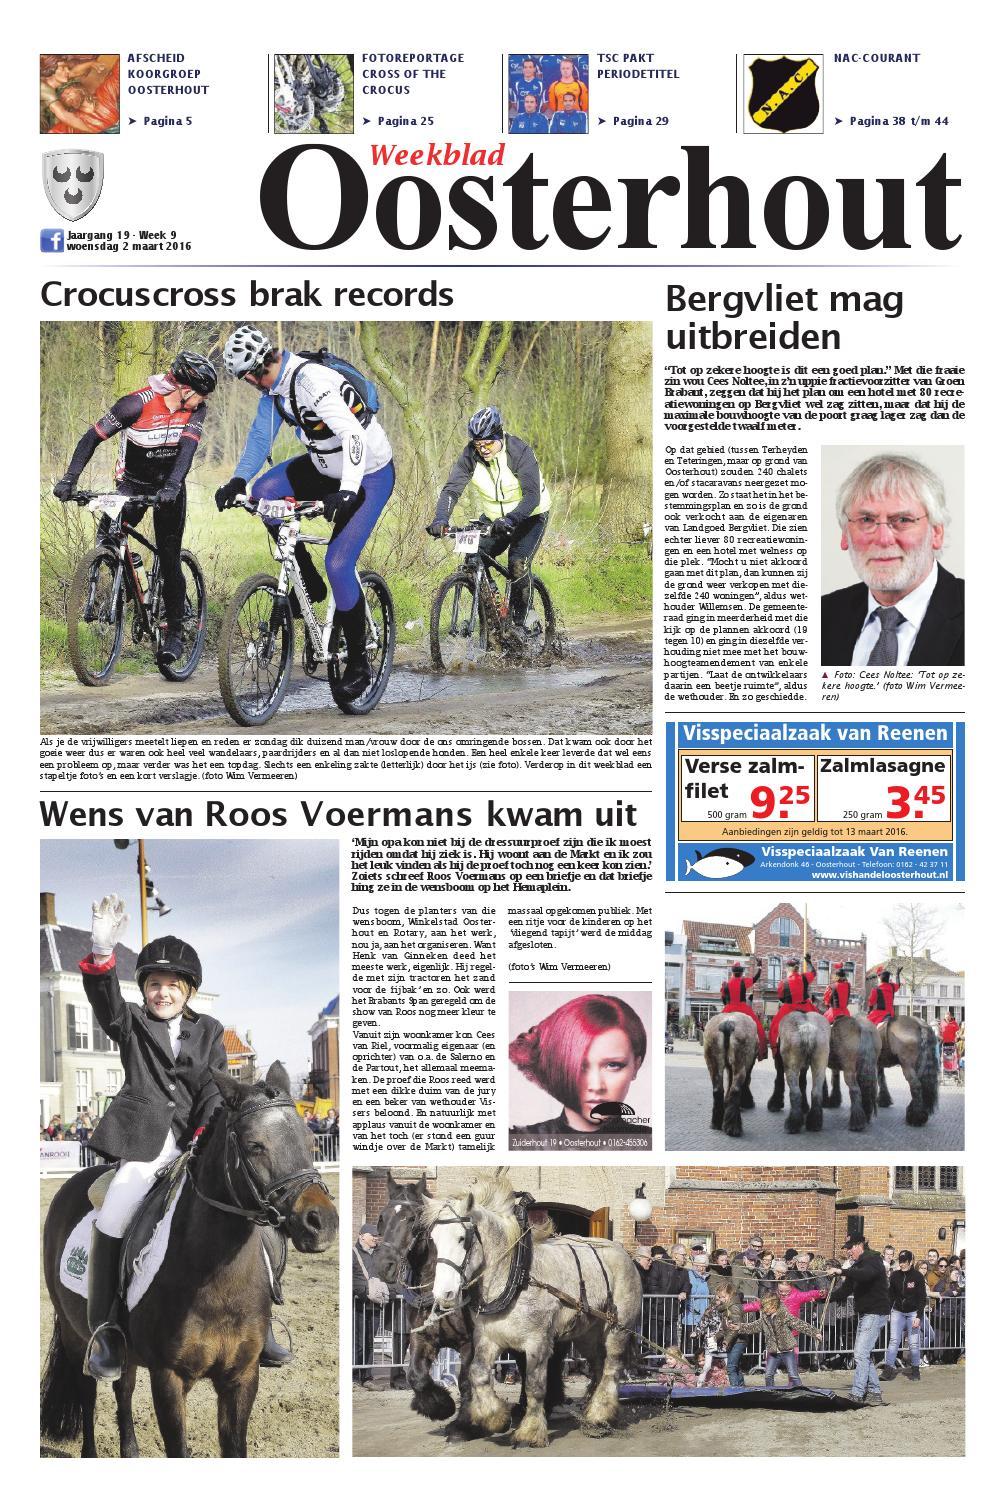 Weekblad Oosterhout 25-11-2015 by Uitgeverij Em de Jong - issuu